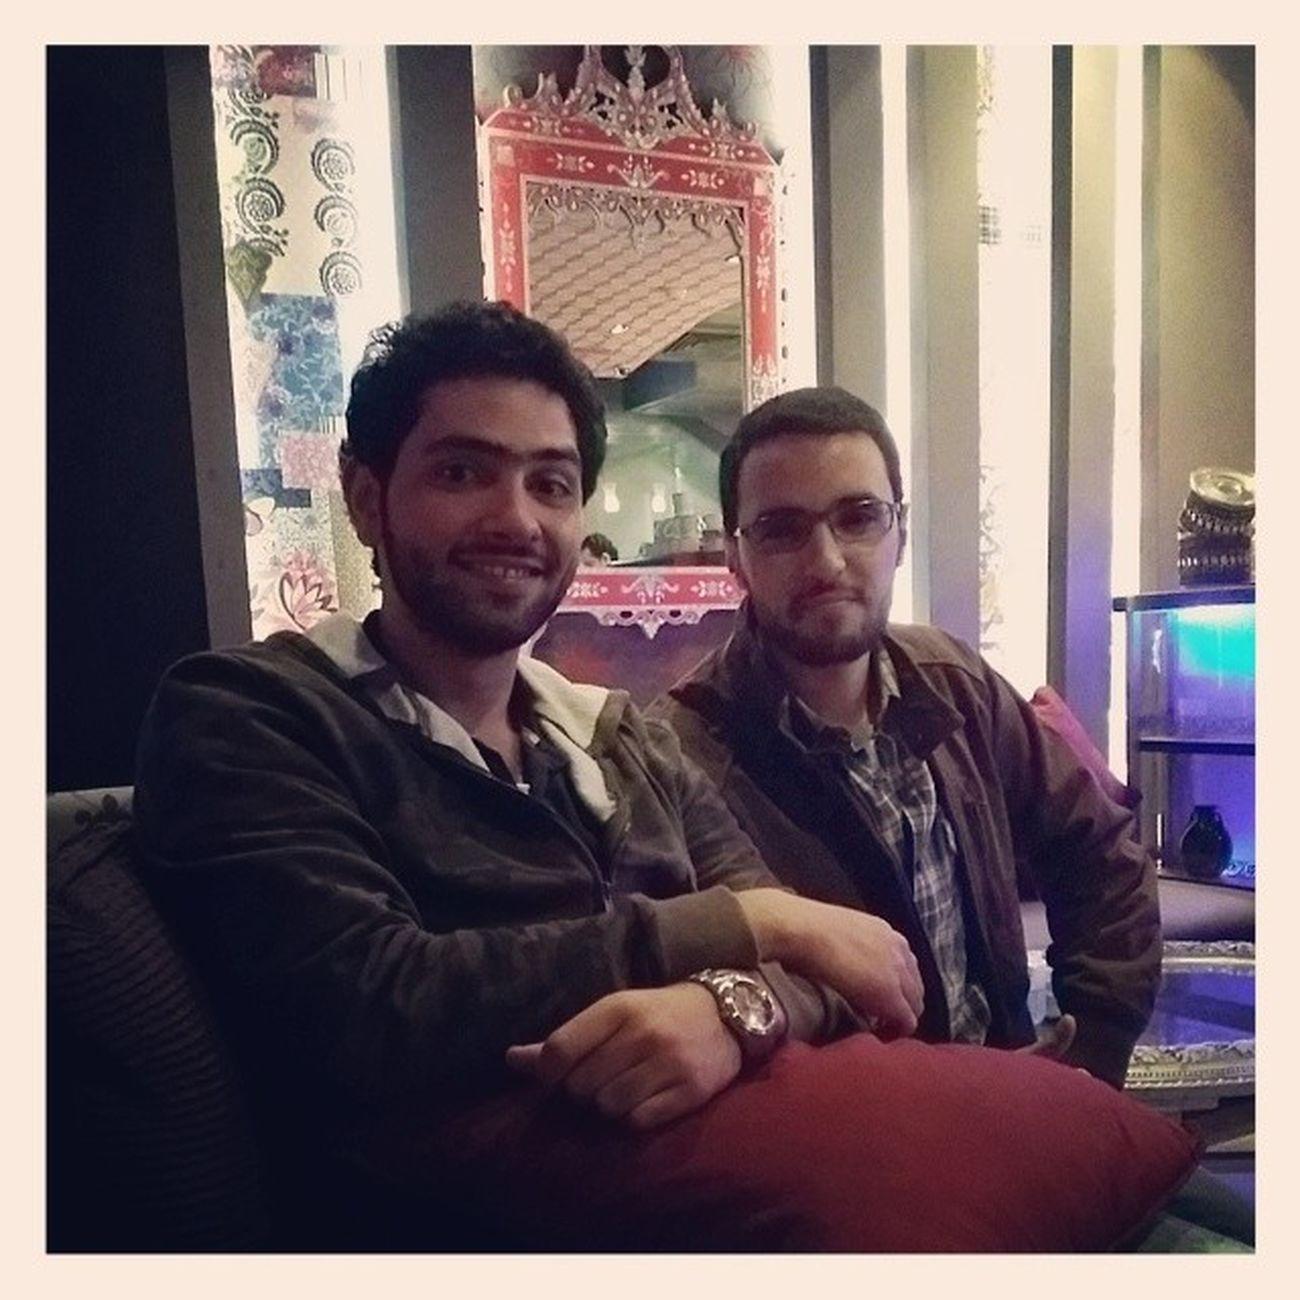 With habiby sa7eb a7la mazag, delaq :D